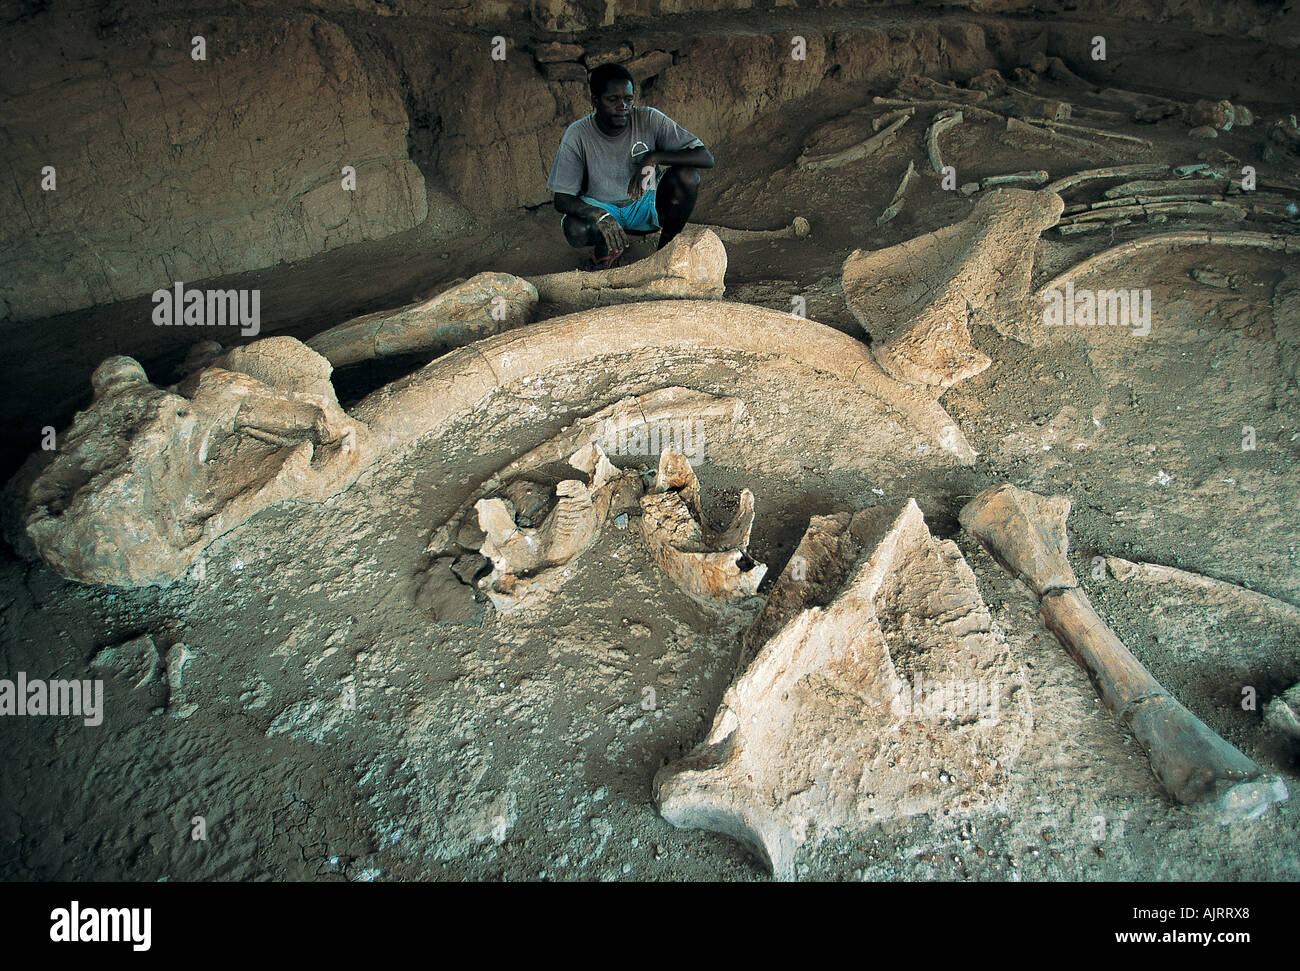 Fossil bones of extinct elephant, Elephas recki, Lake Turkana Kenya. - Stock Image